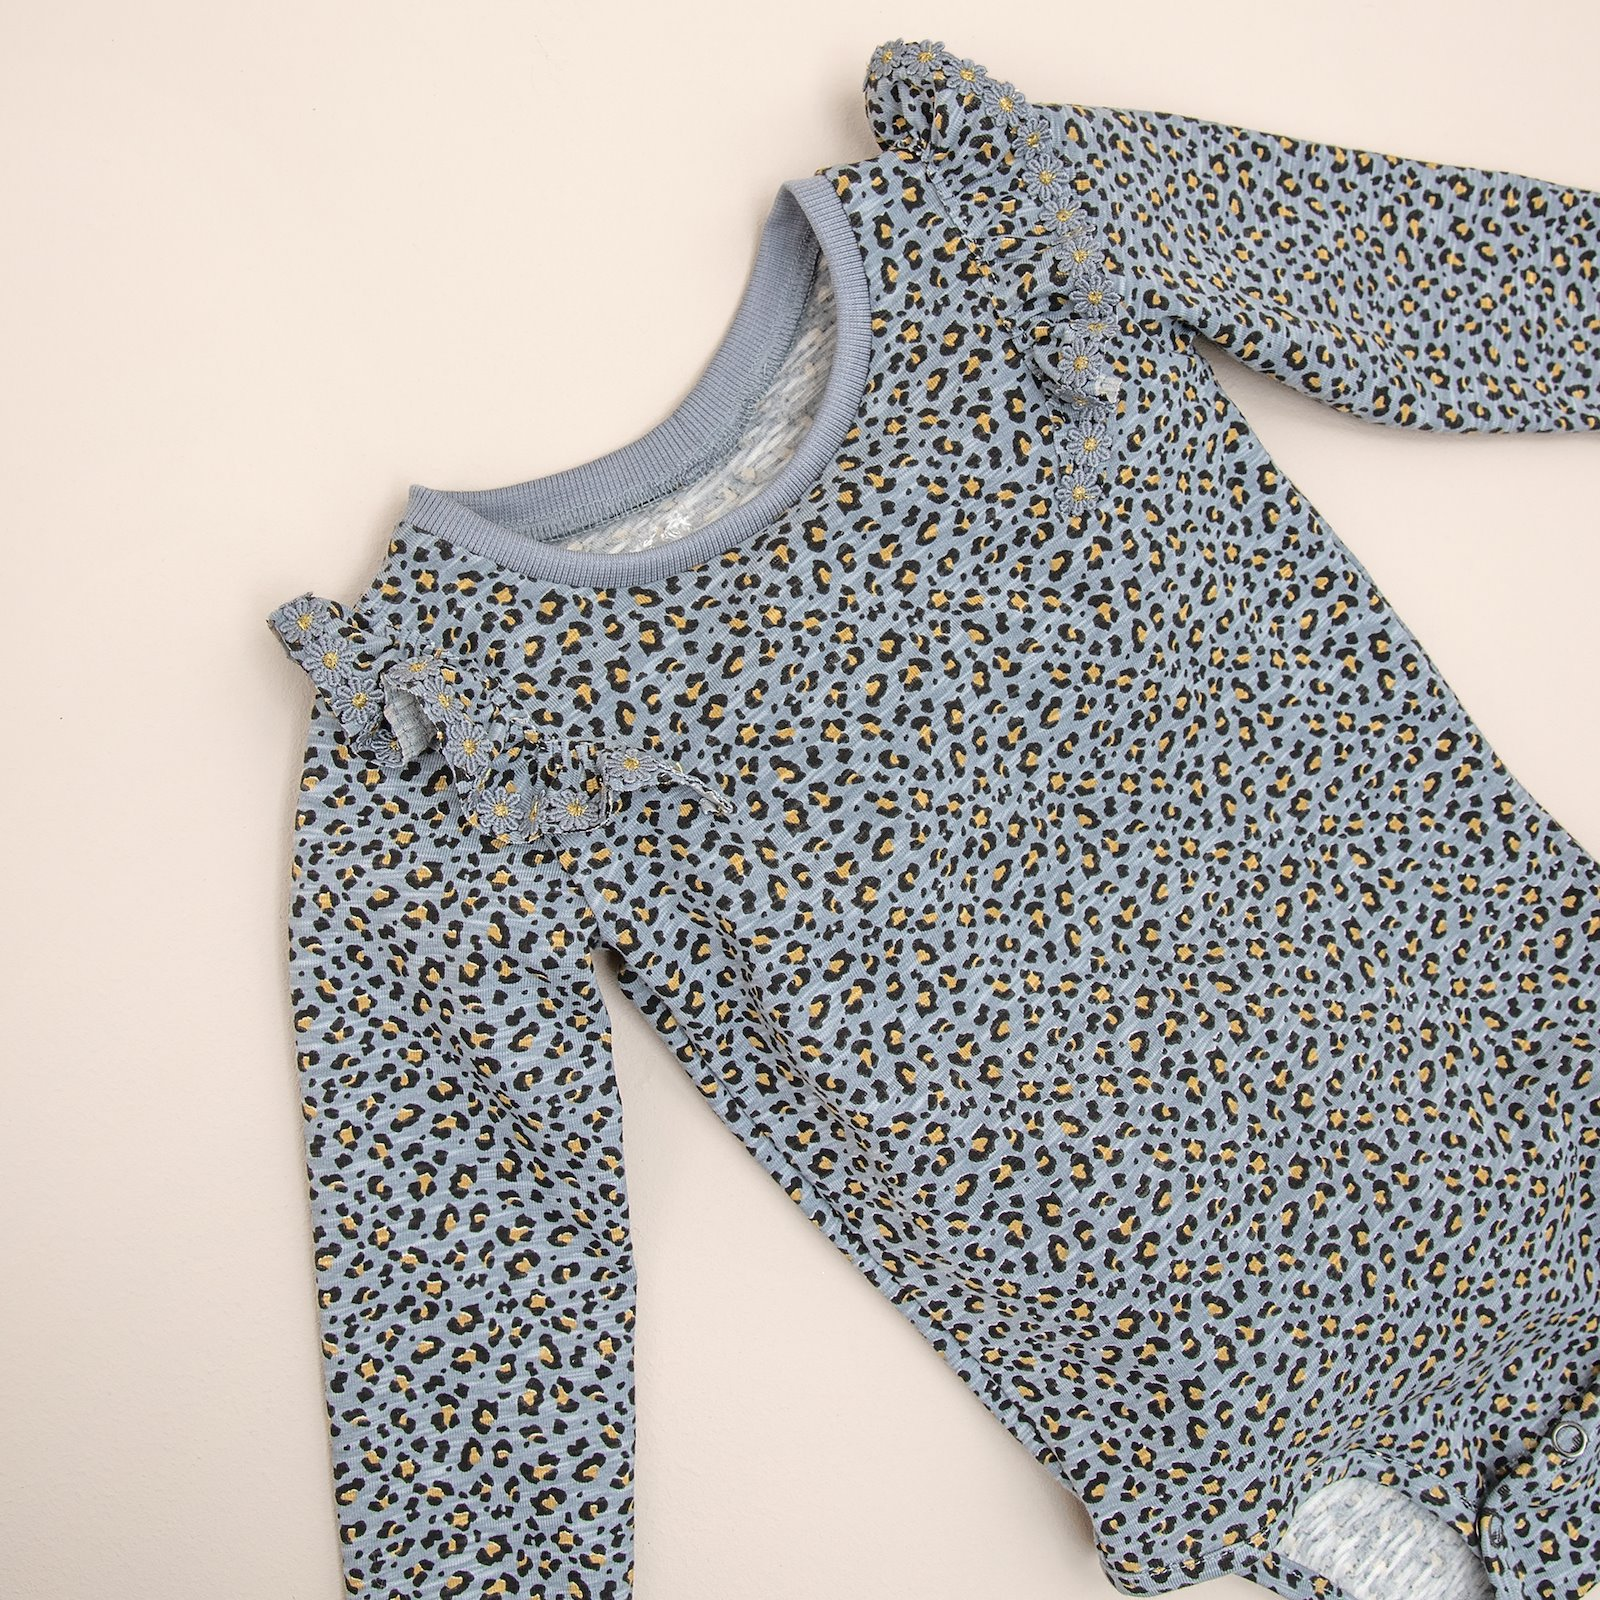 Bodysuit and skirt, 68/3m p81027_272788_272778_22209_sskit